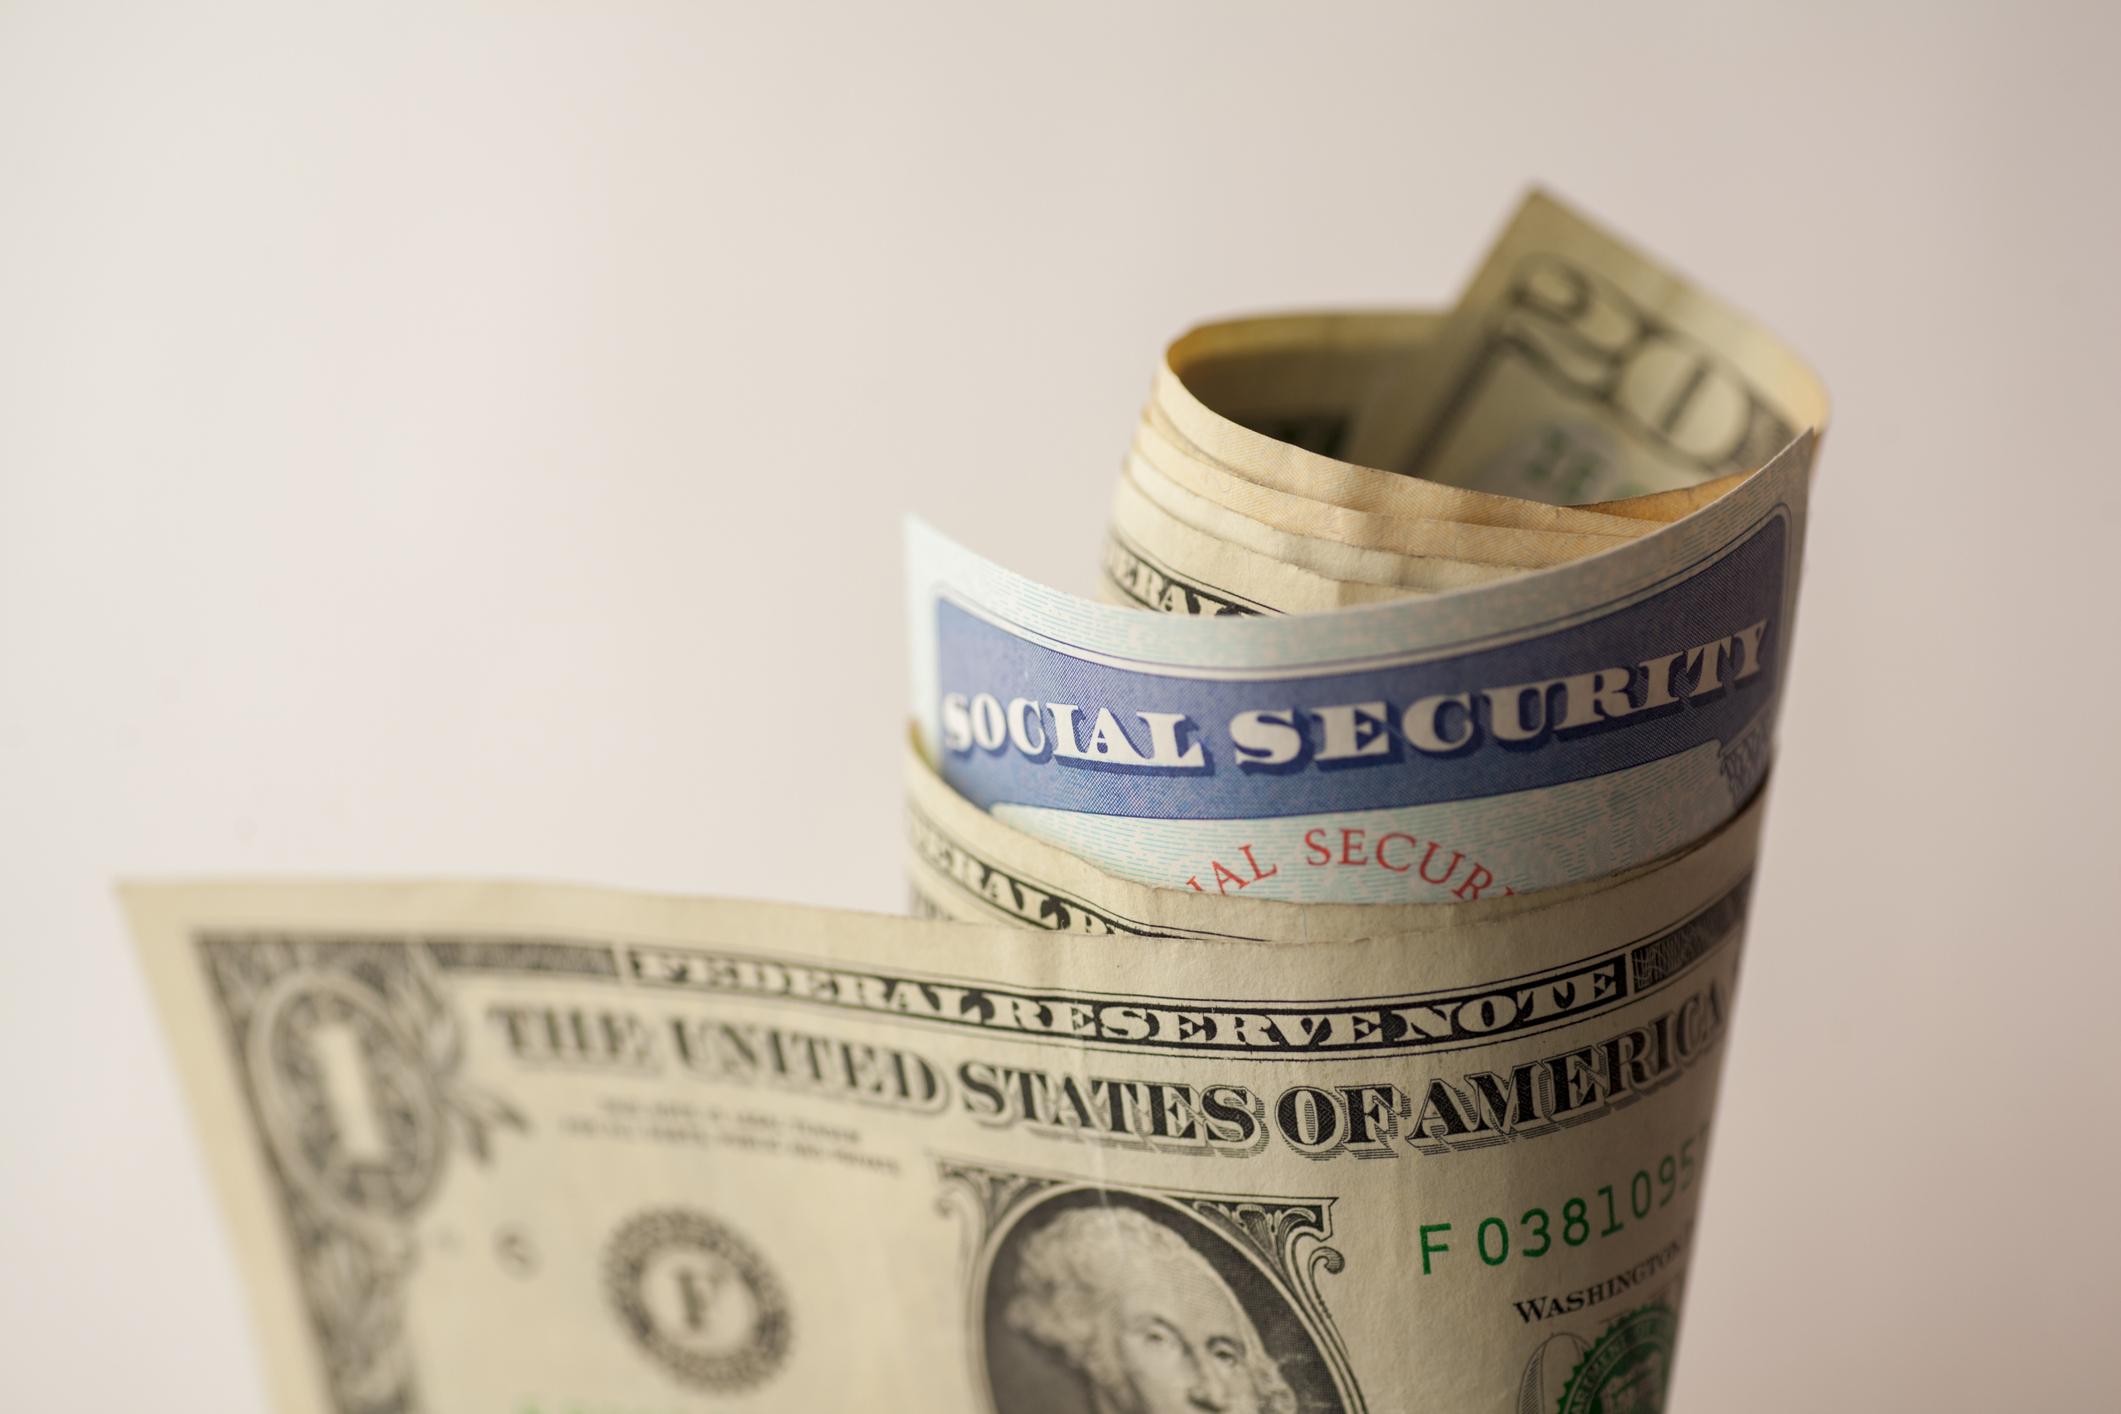 3 Ways to Score an Even Bigger Social Security Check